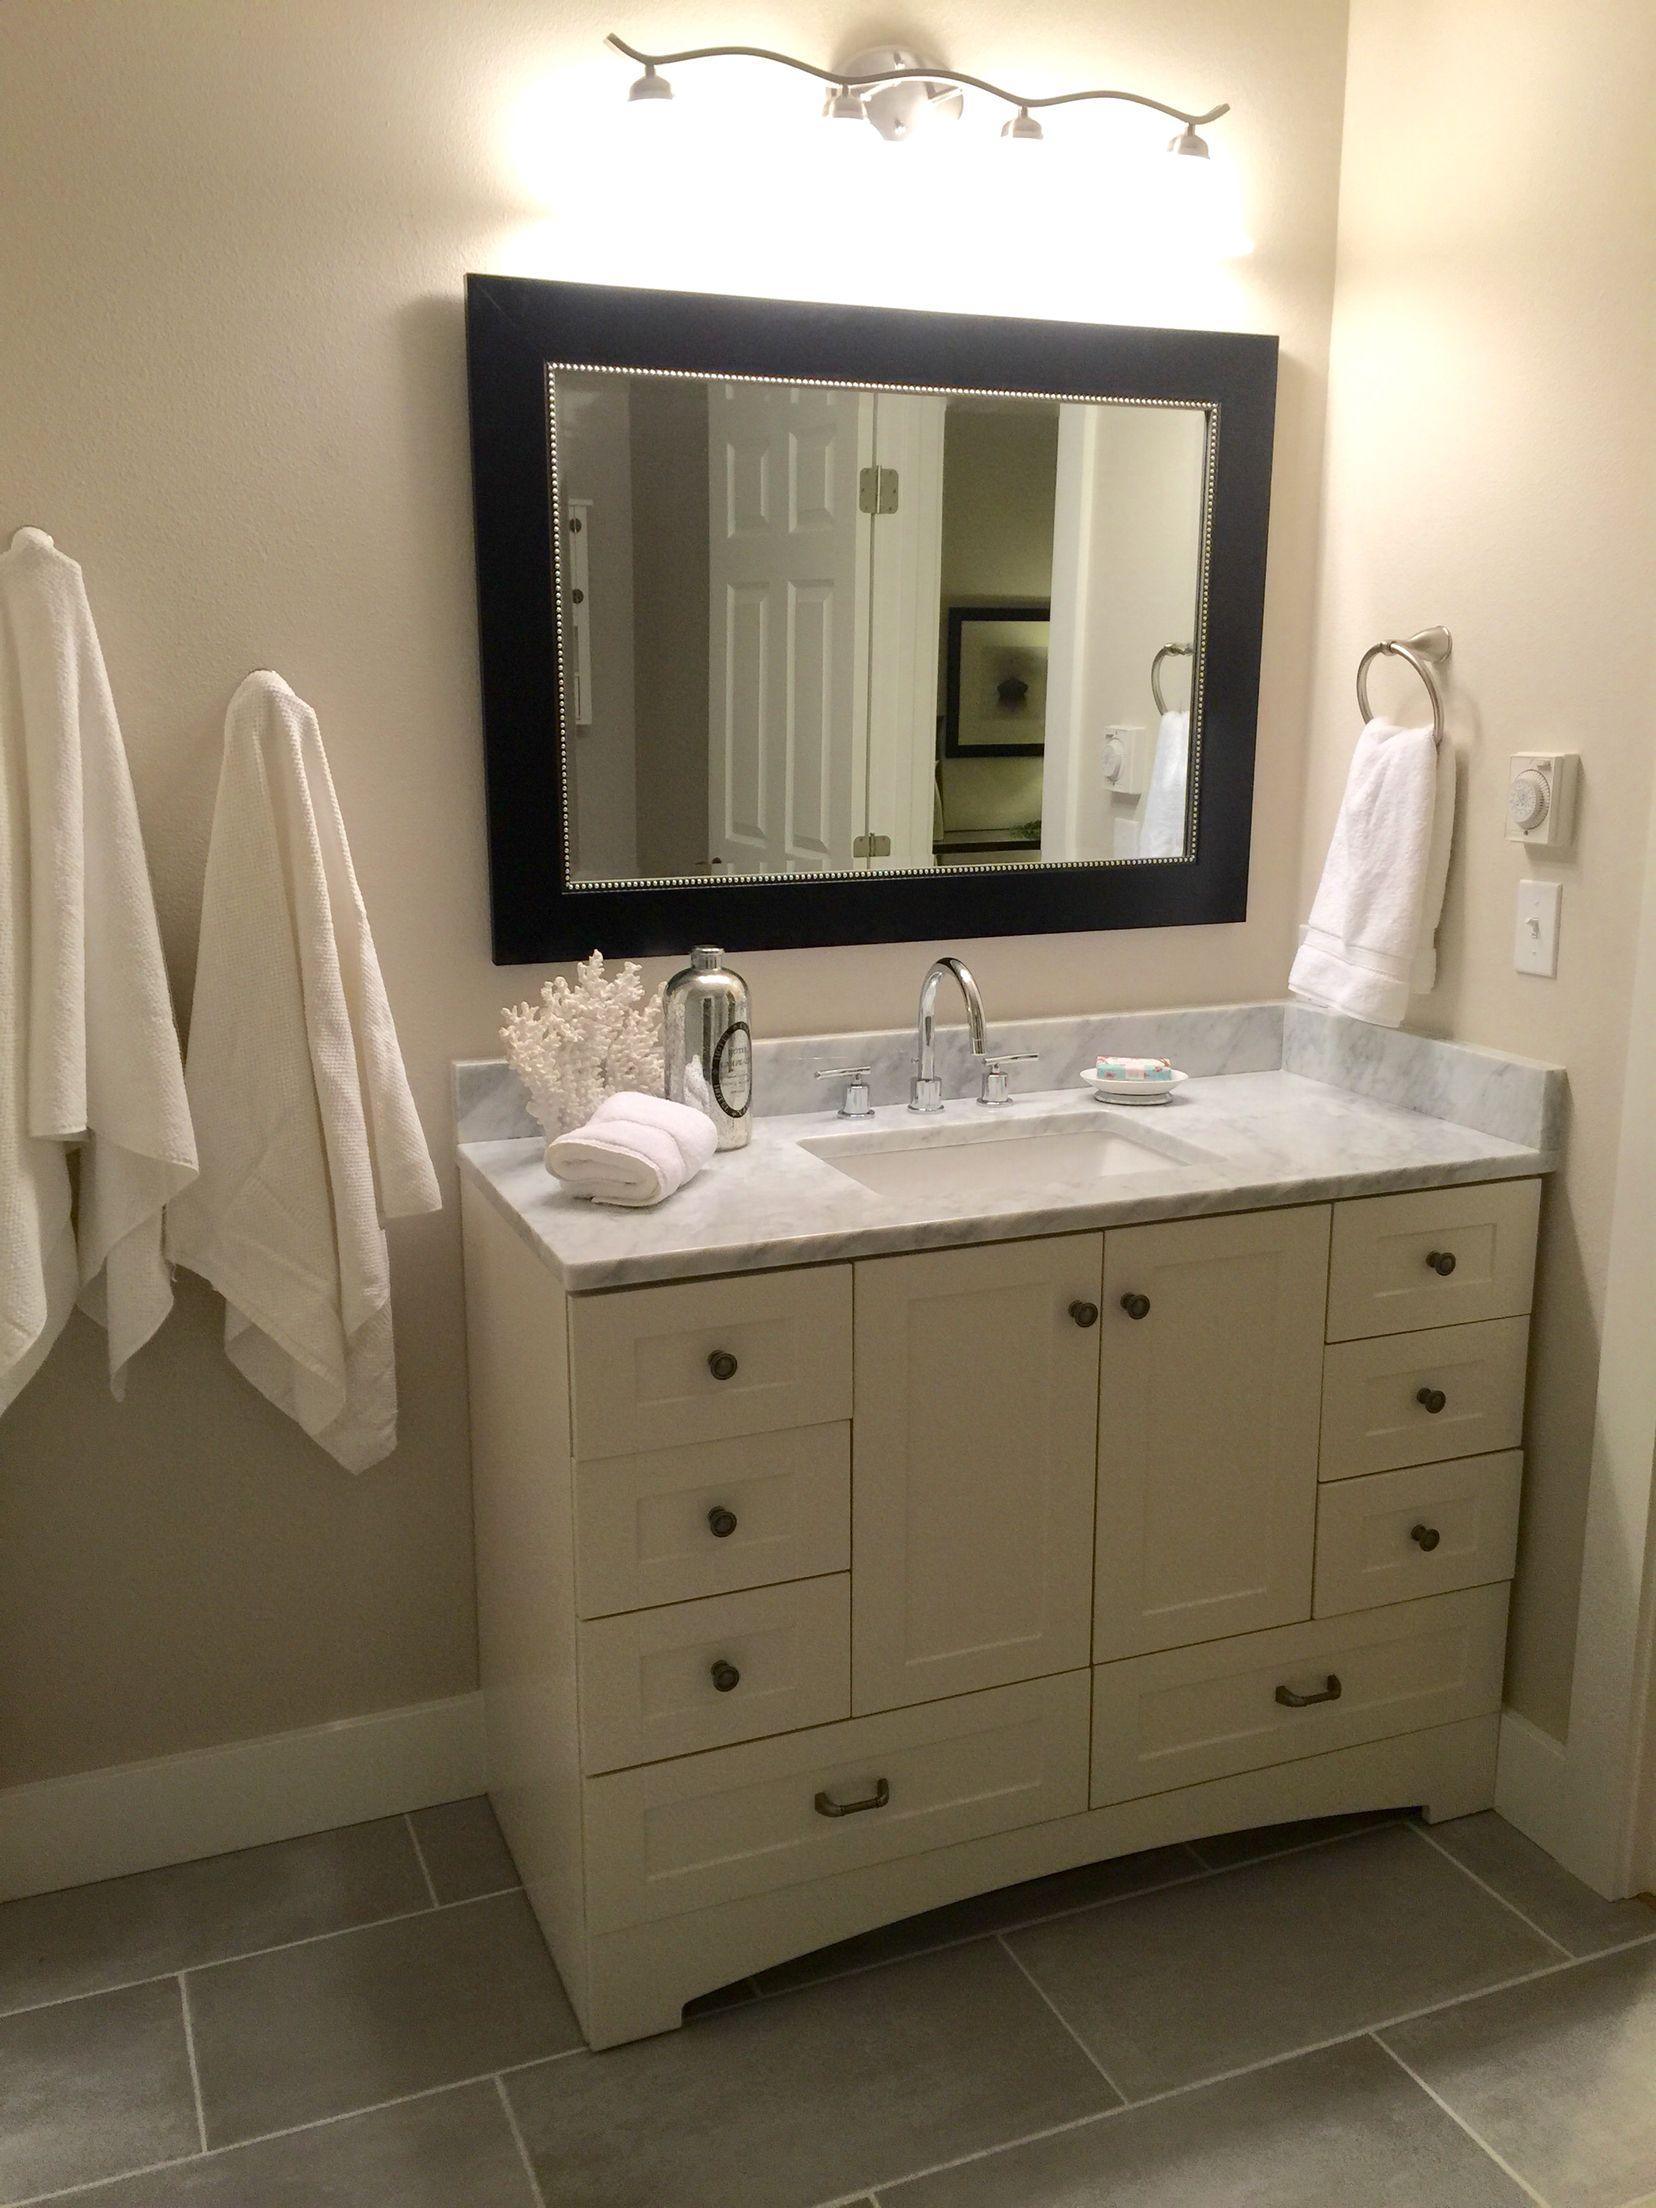 Bathroom update / remodel on a budget, Benjamin Moore - Edgecomb ...